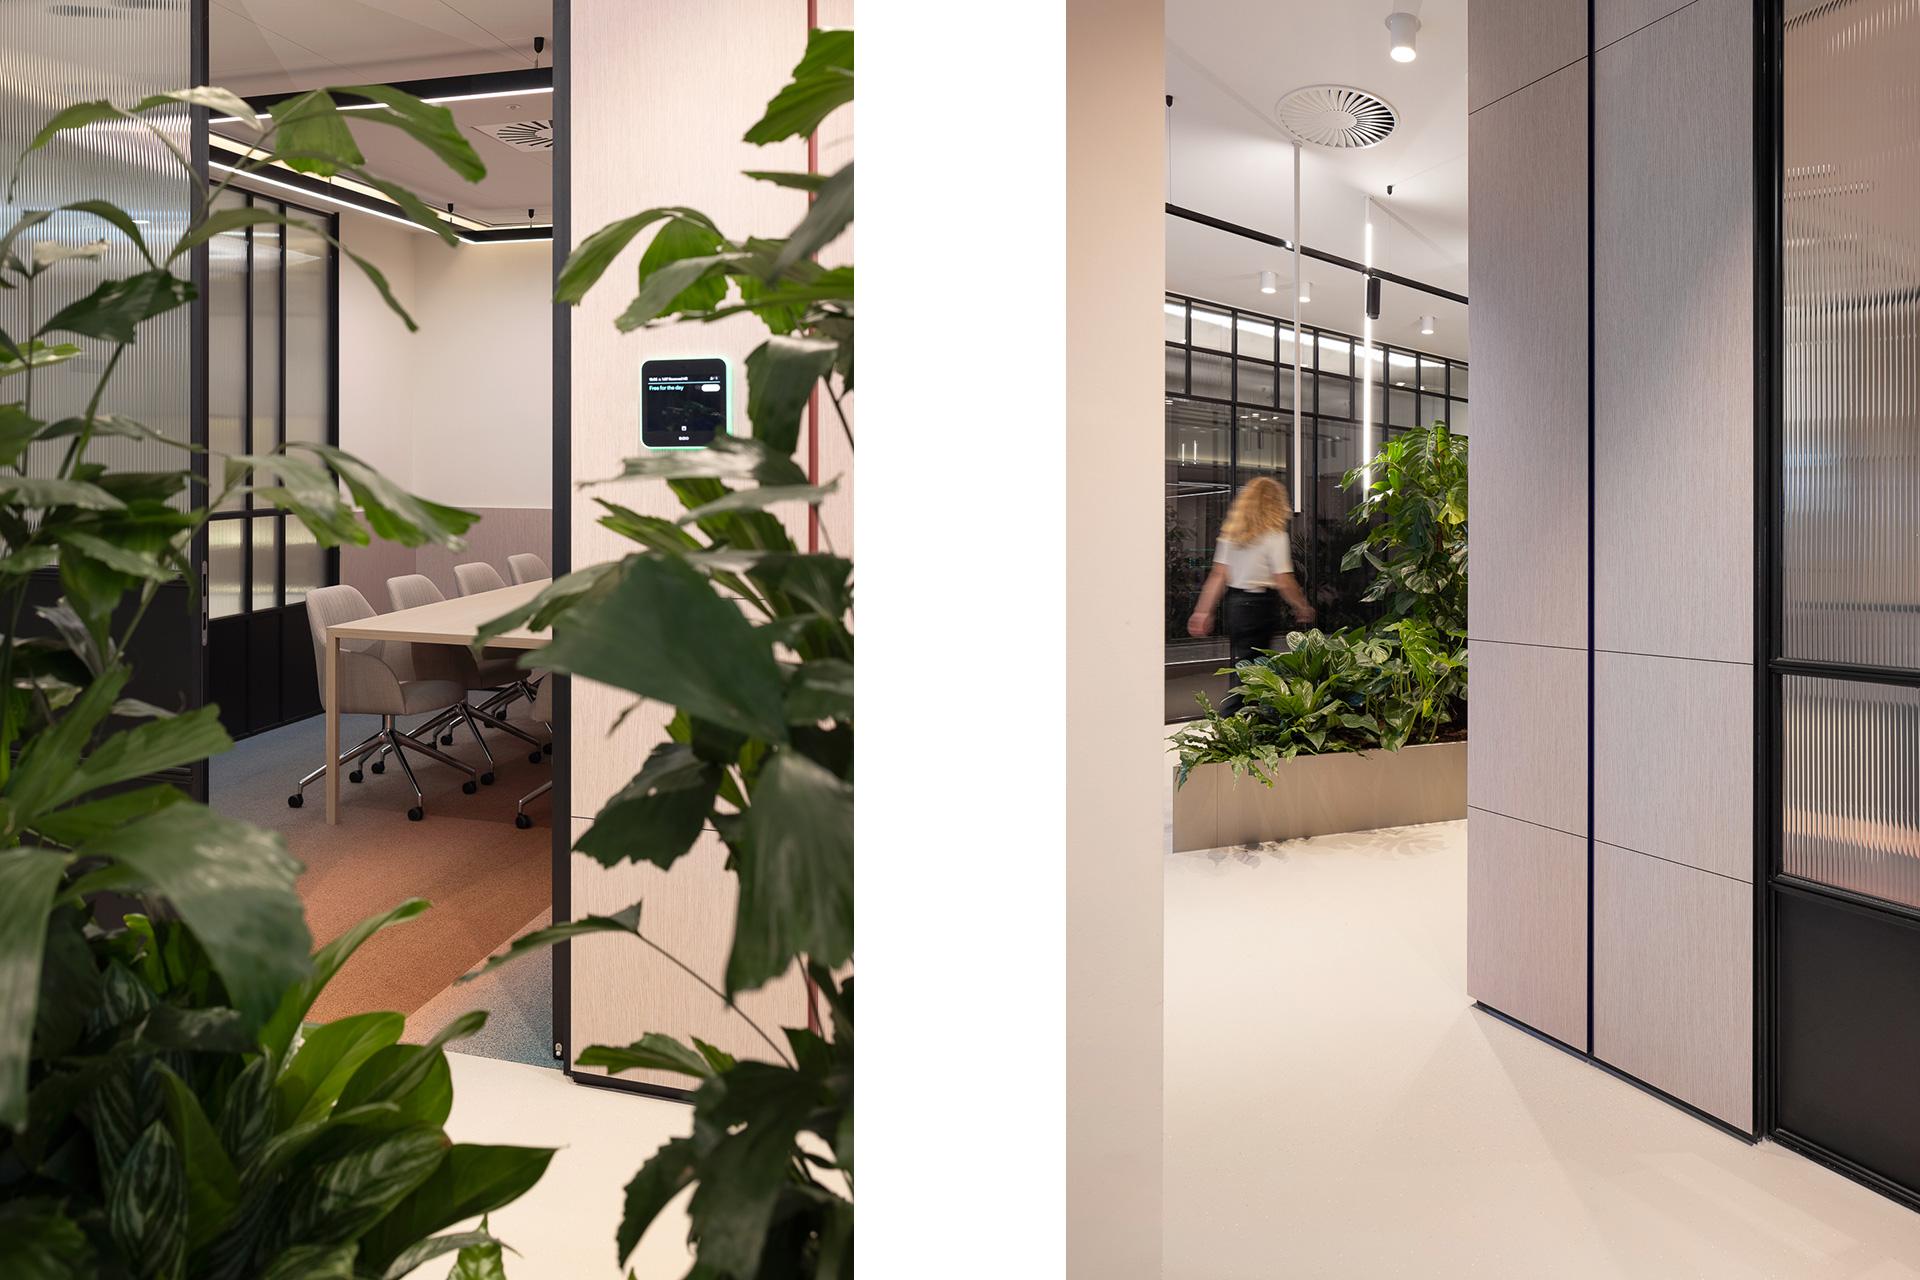 SP2020-Guerrilla-Games-Amsterdam-Office-Interieurfotografie-13